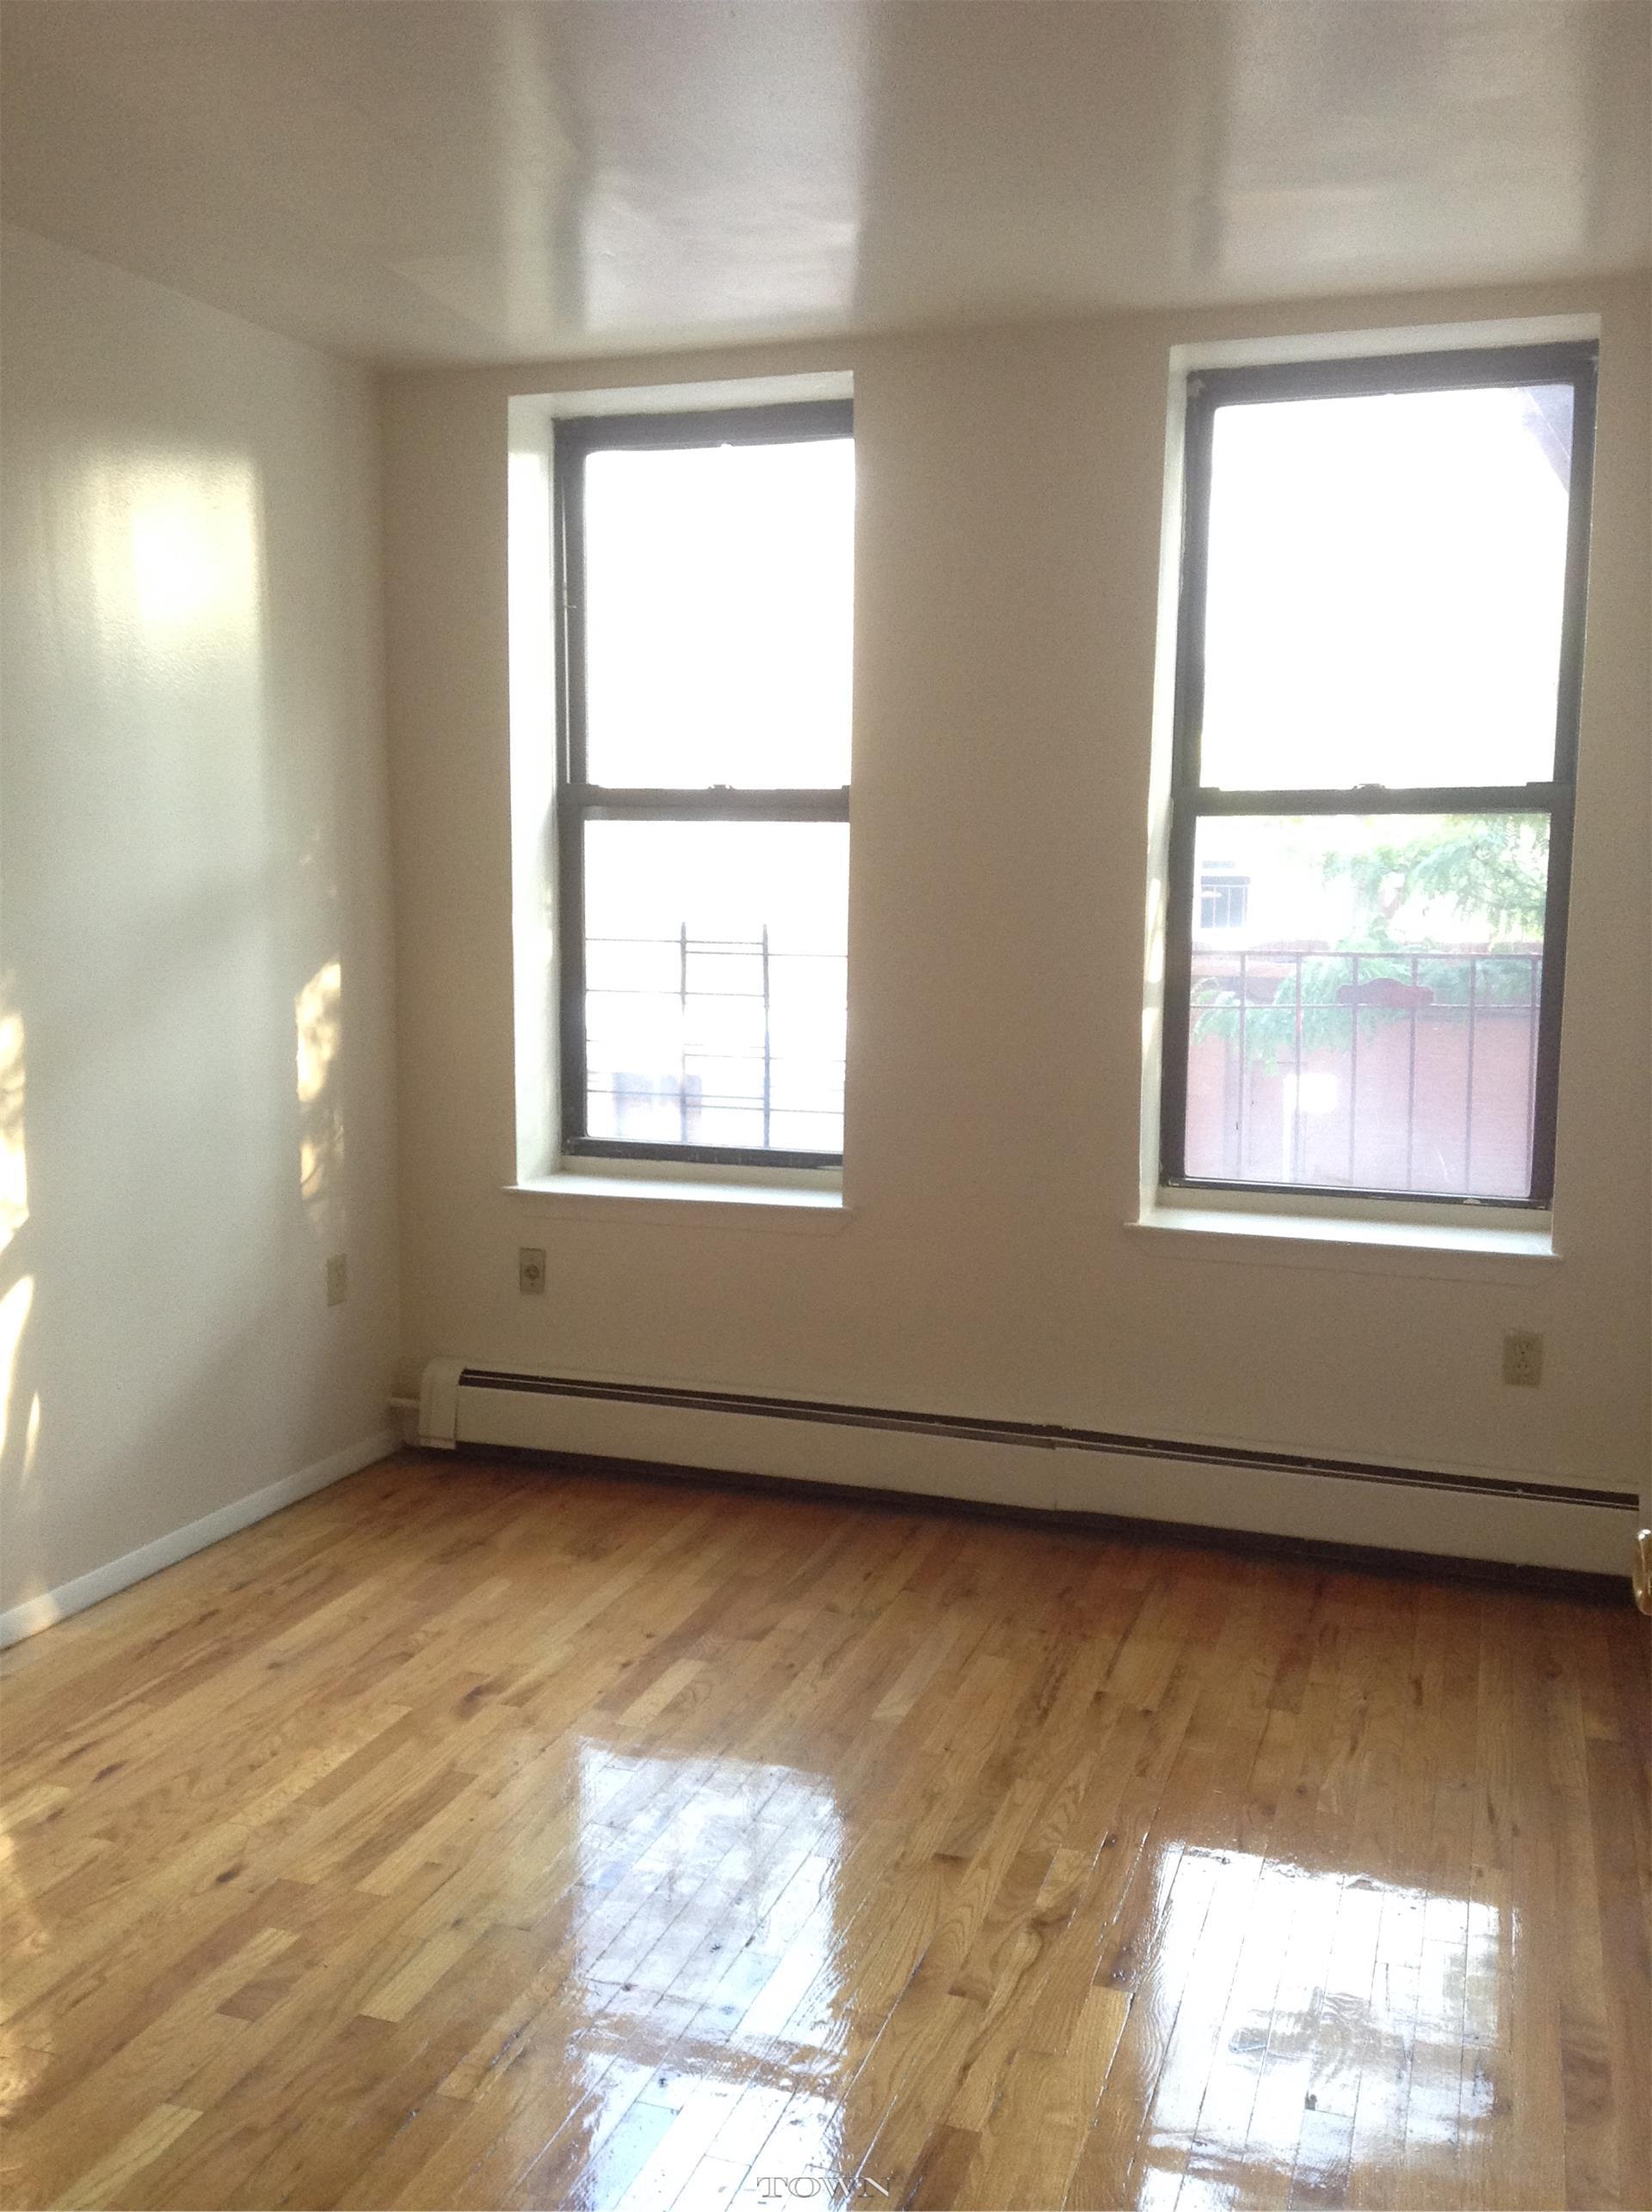 279 East 92nd Street